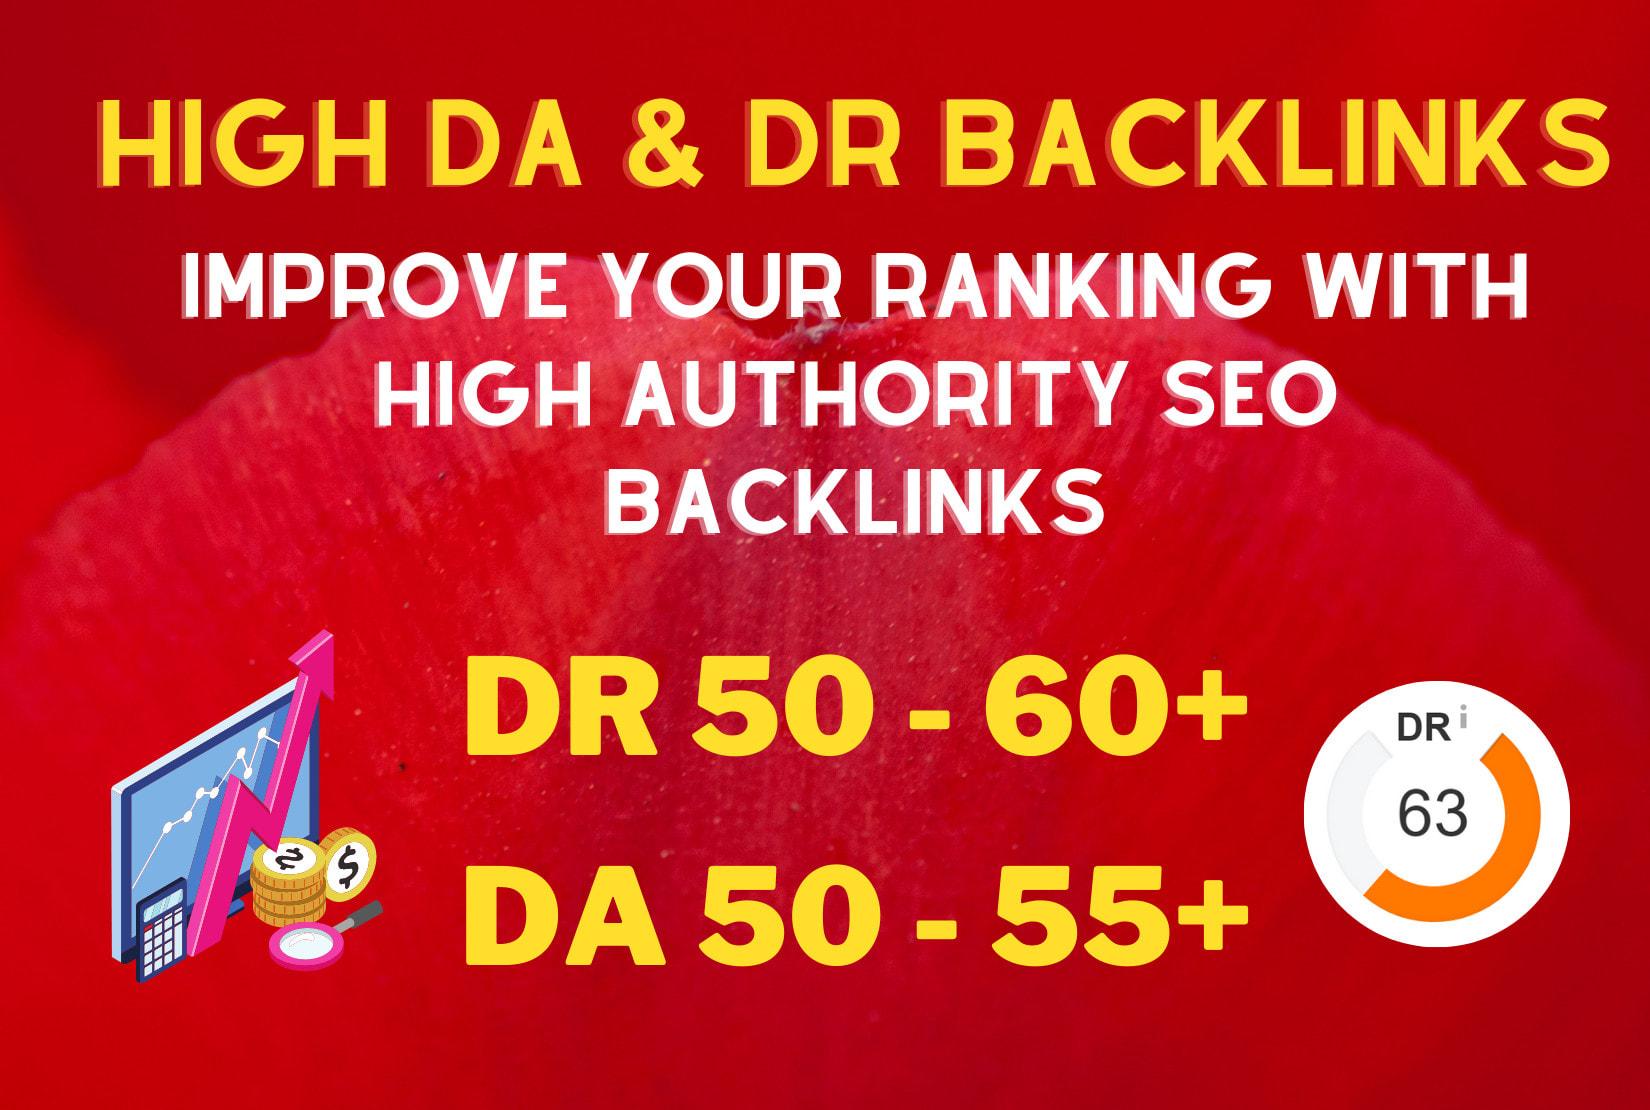 create 300 high authority da DR 50 60 off page SEO dofollow contextual backlinks